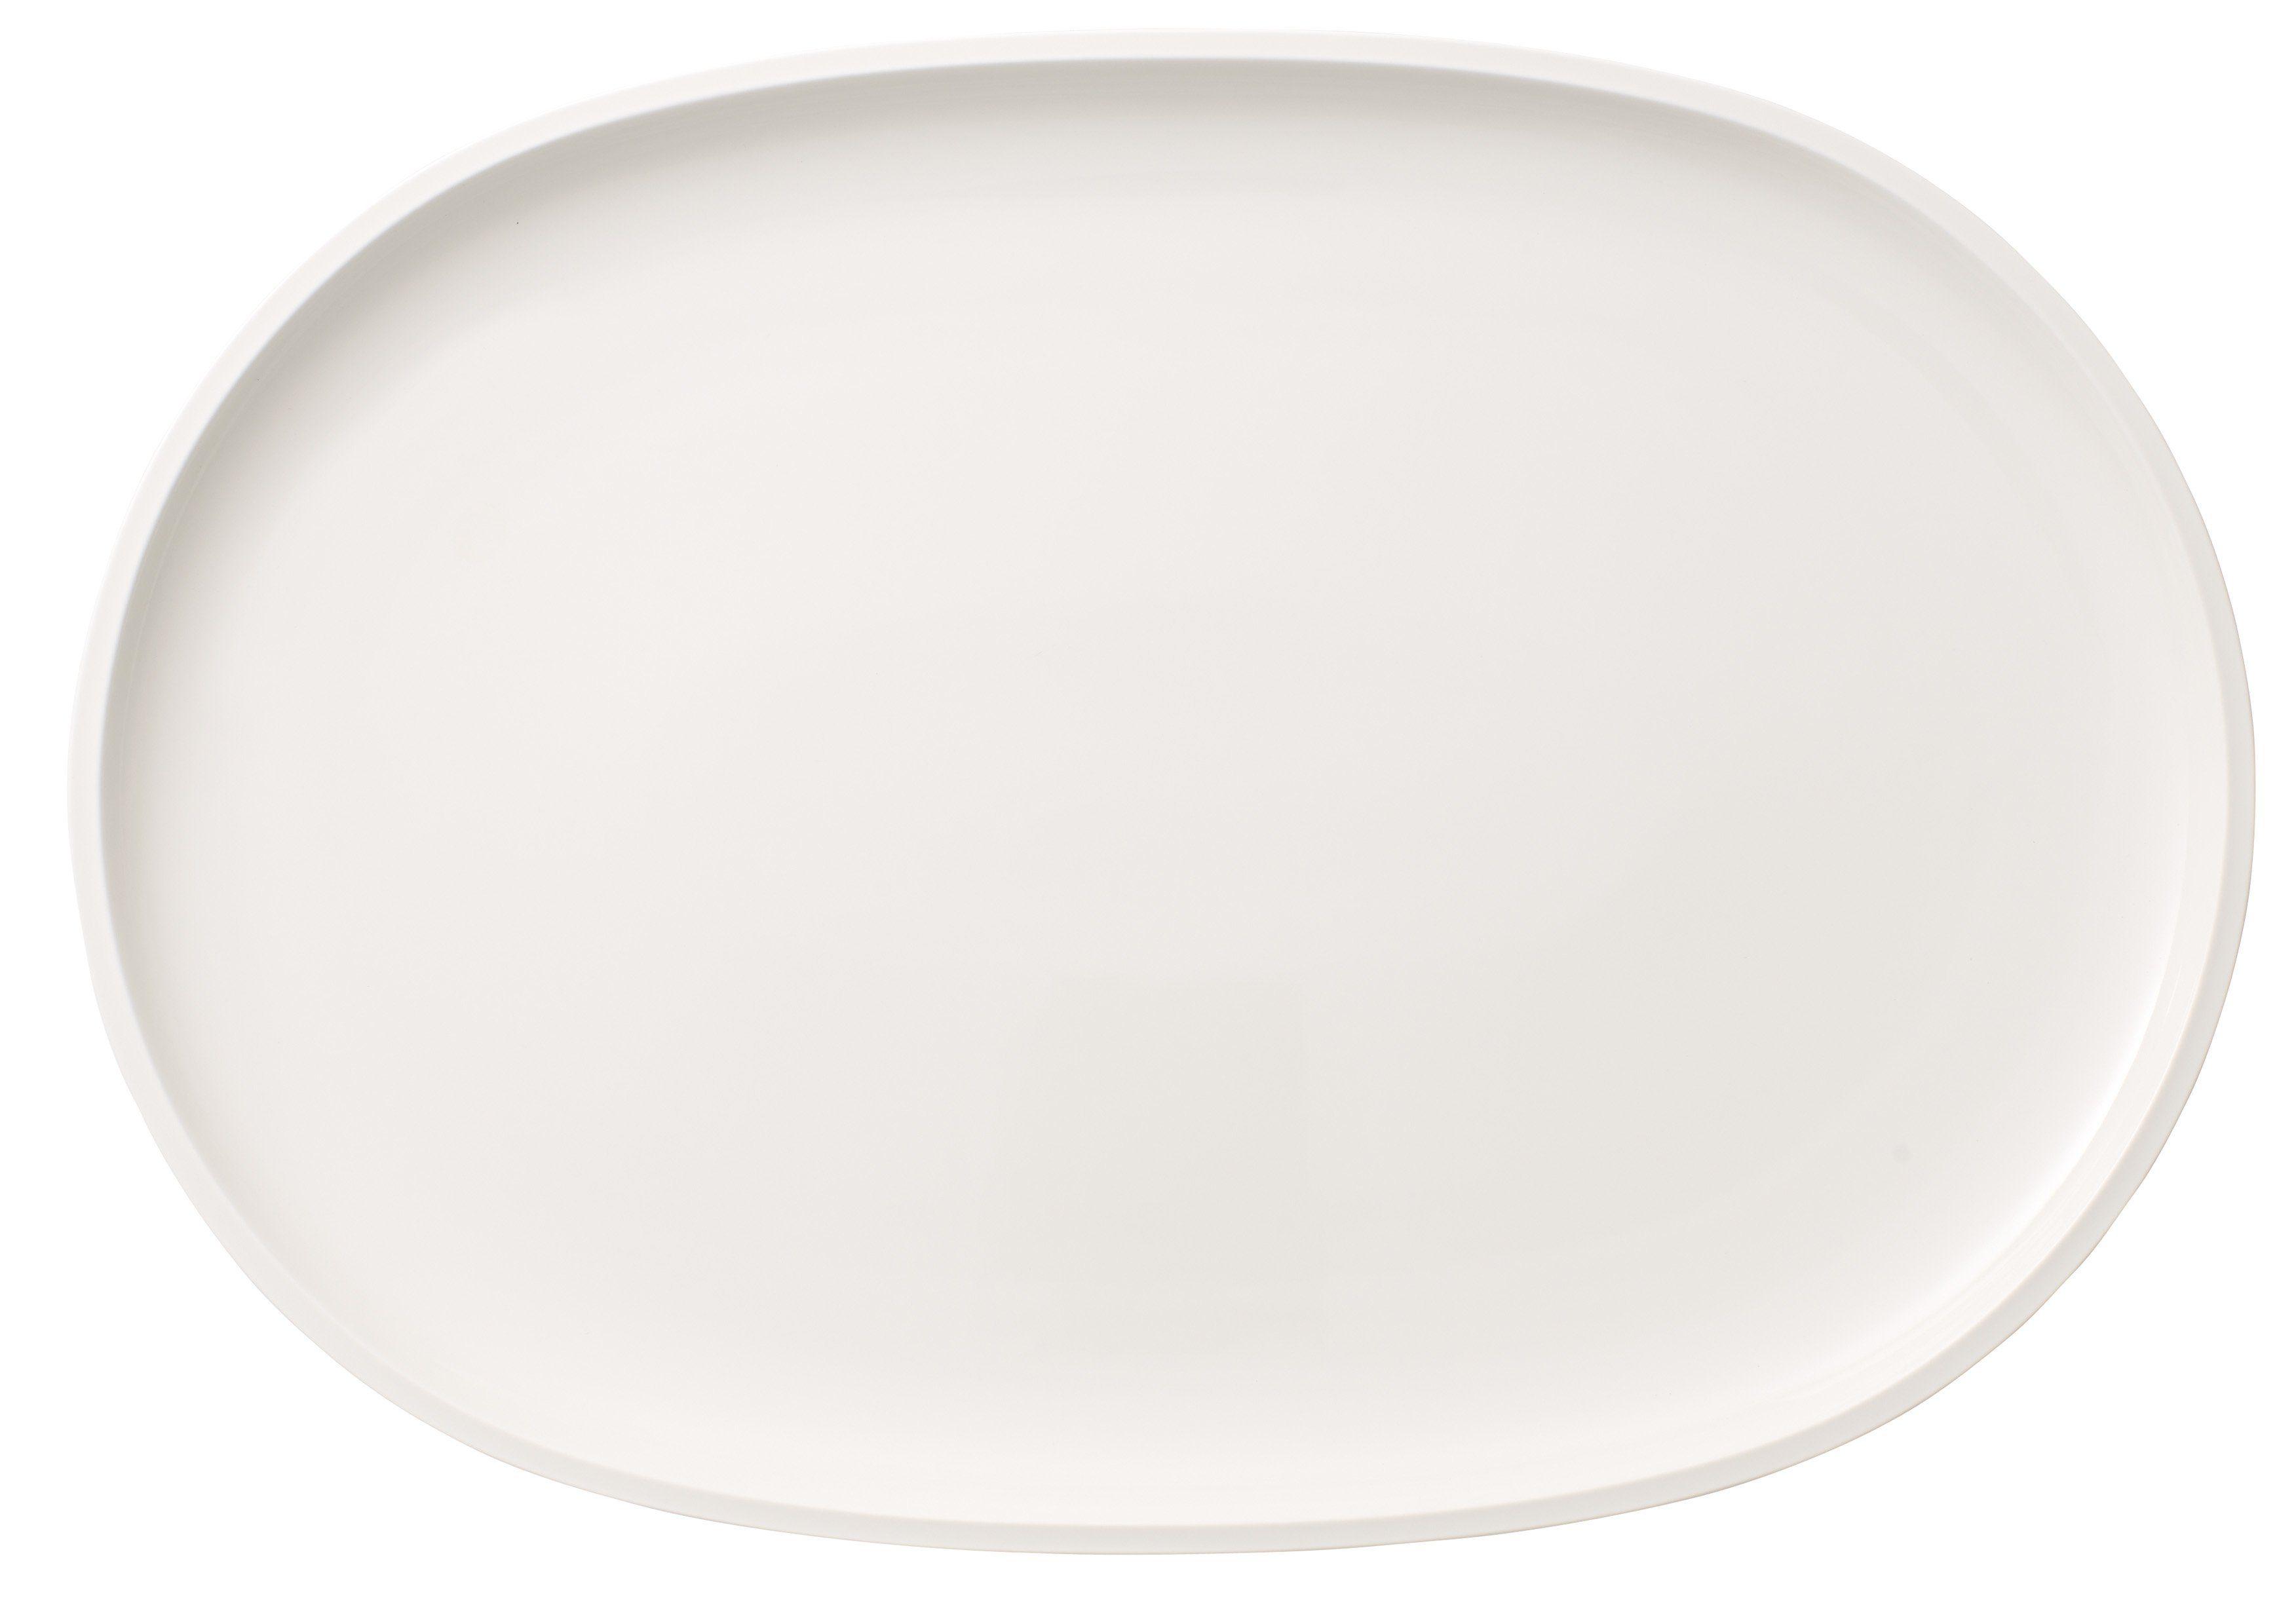 Villeroy & Boch Fischteller oval »Artesano Original«